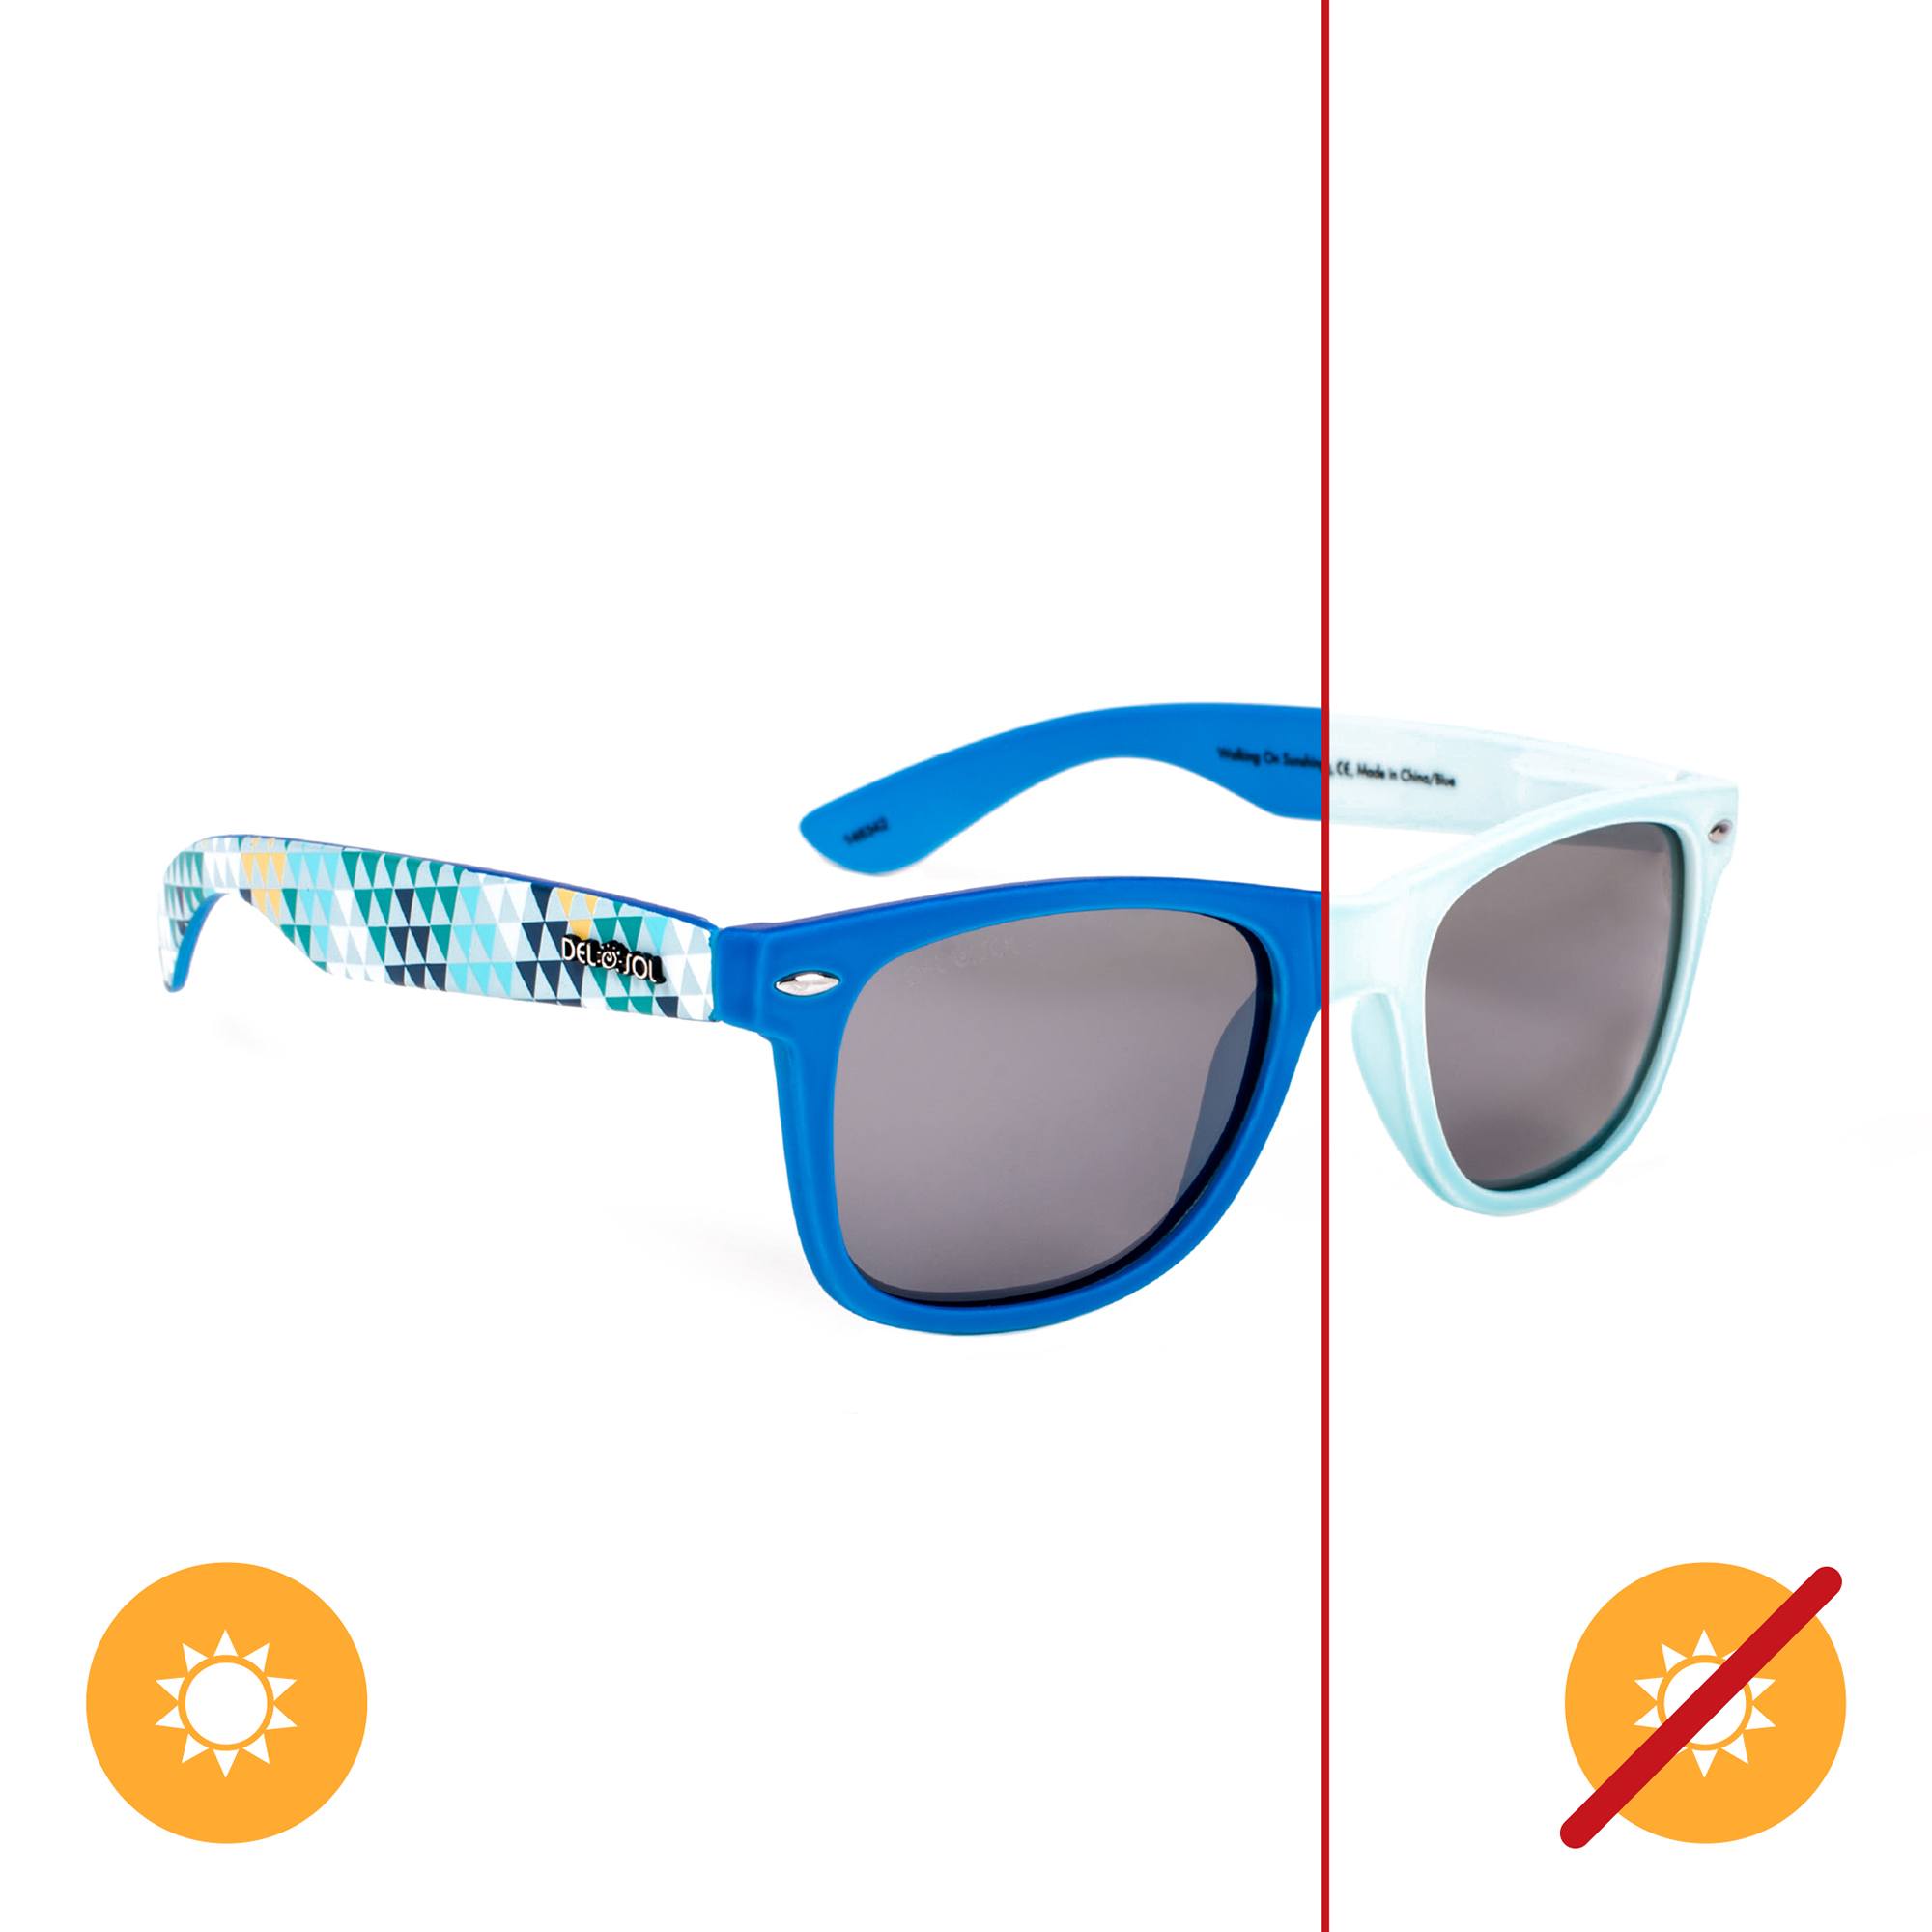 Del Sol Solize Color-Changing Unisex Sunglasses - Walking ...